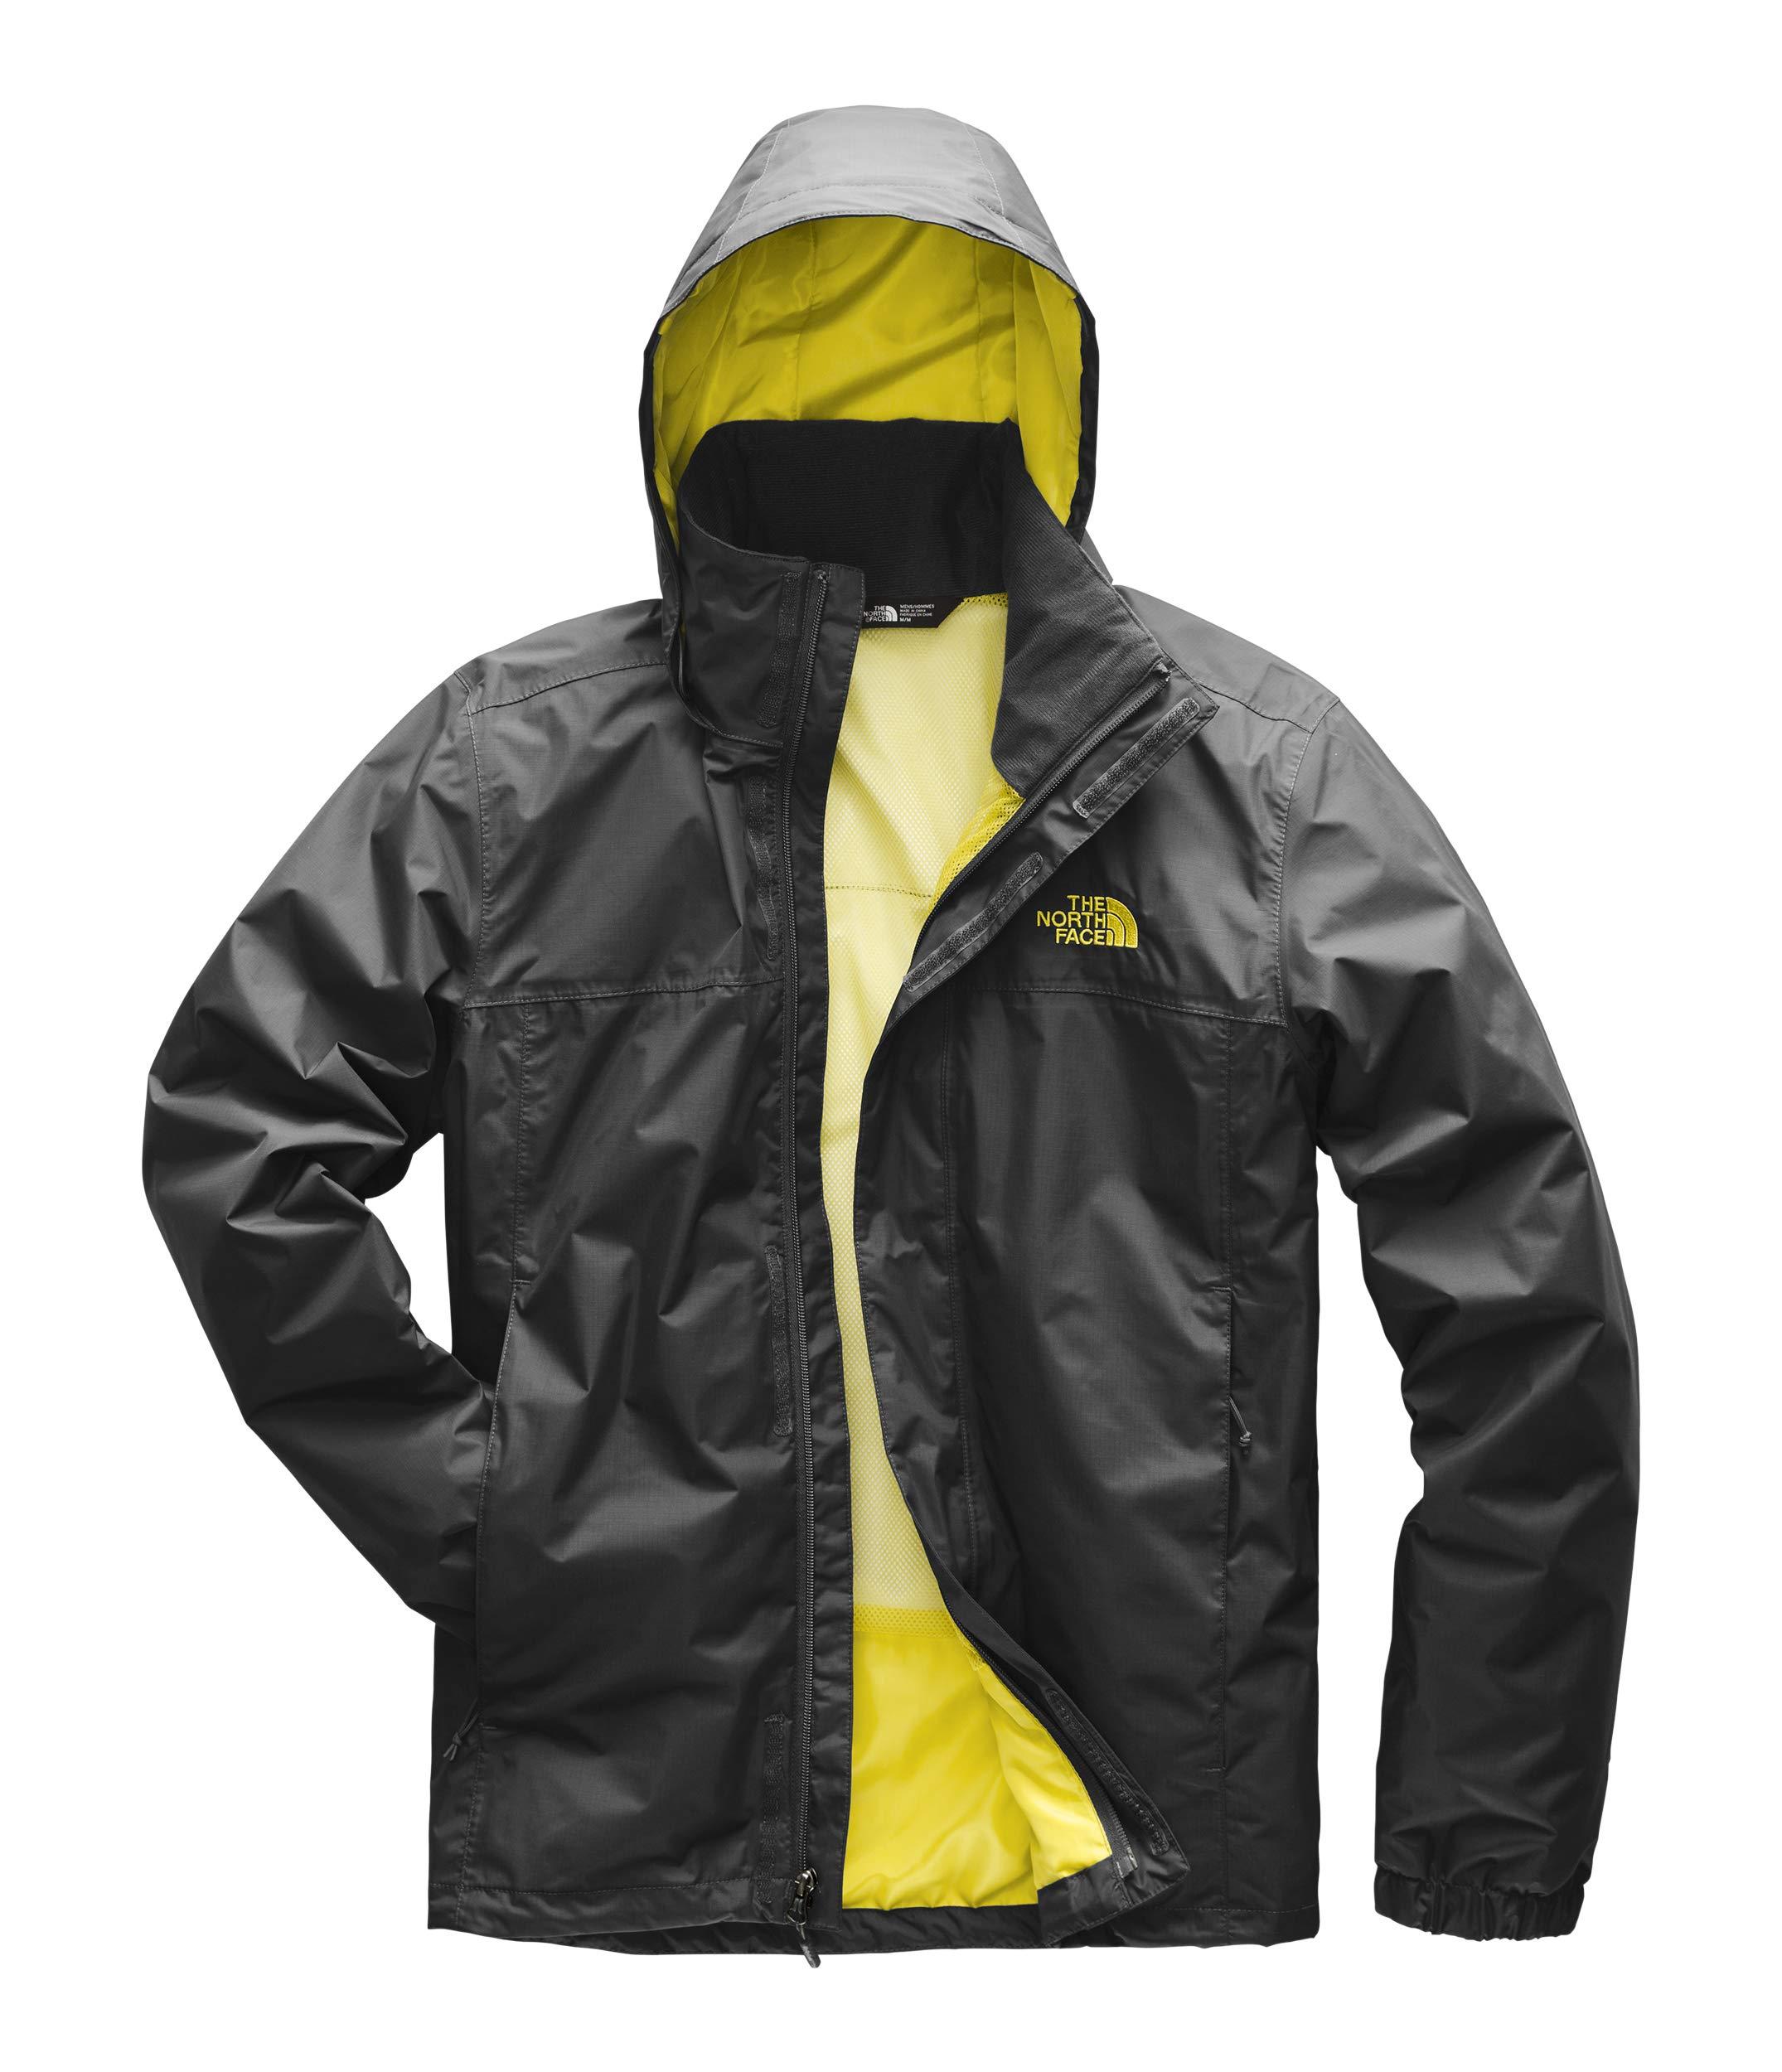 def07e658 The North Face Men's Resolve 2 Jacket Asphalt Grey/Acid Yellow X-Large